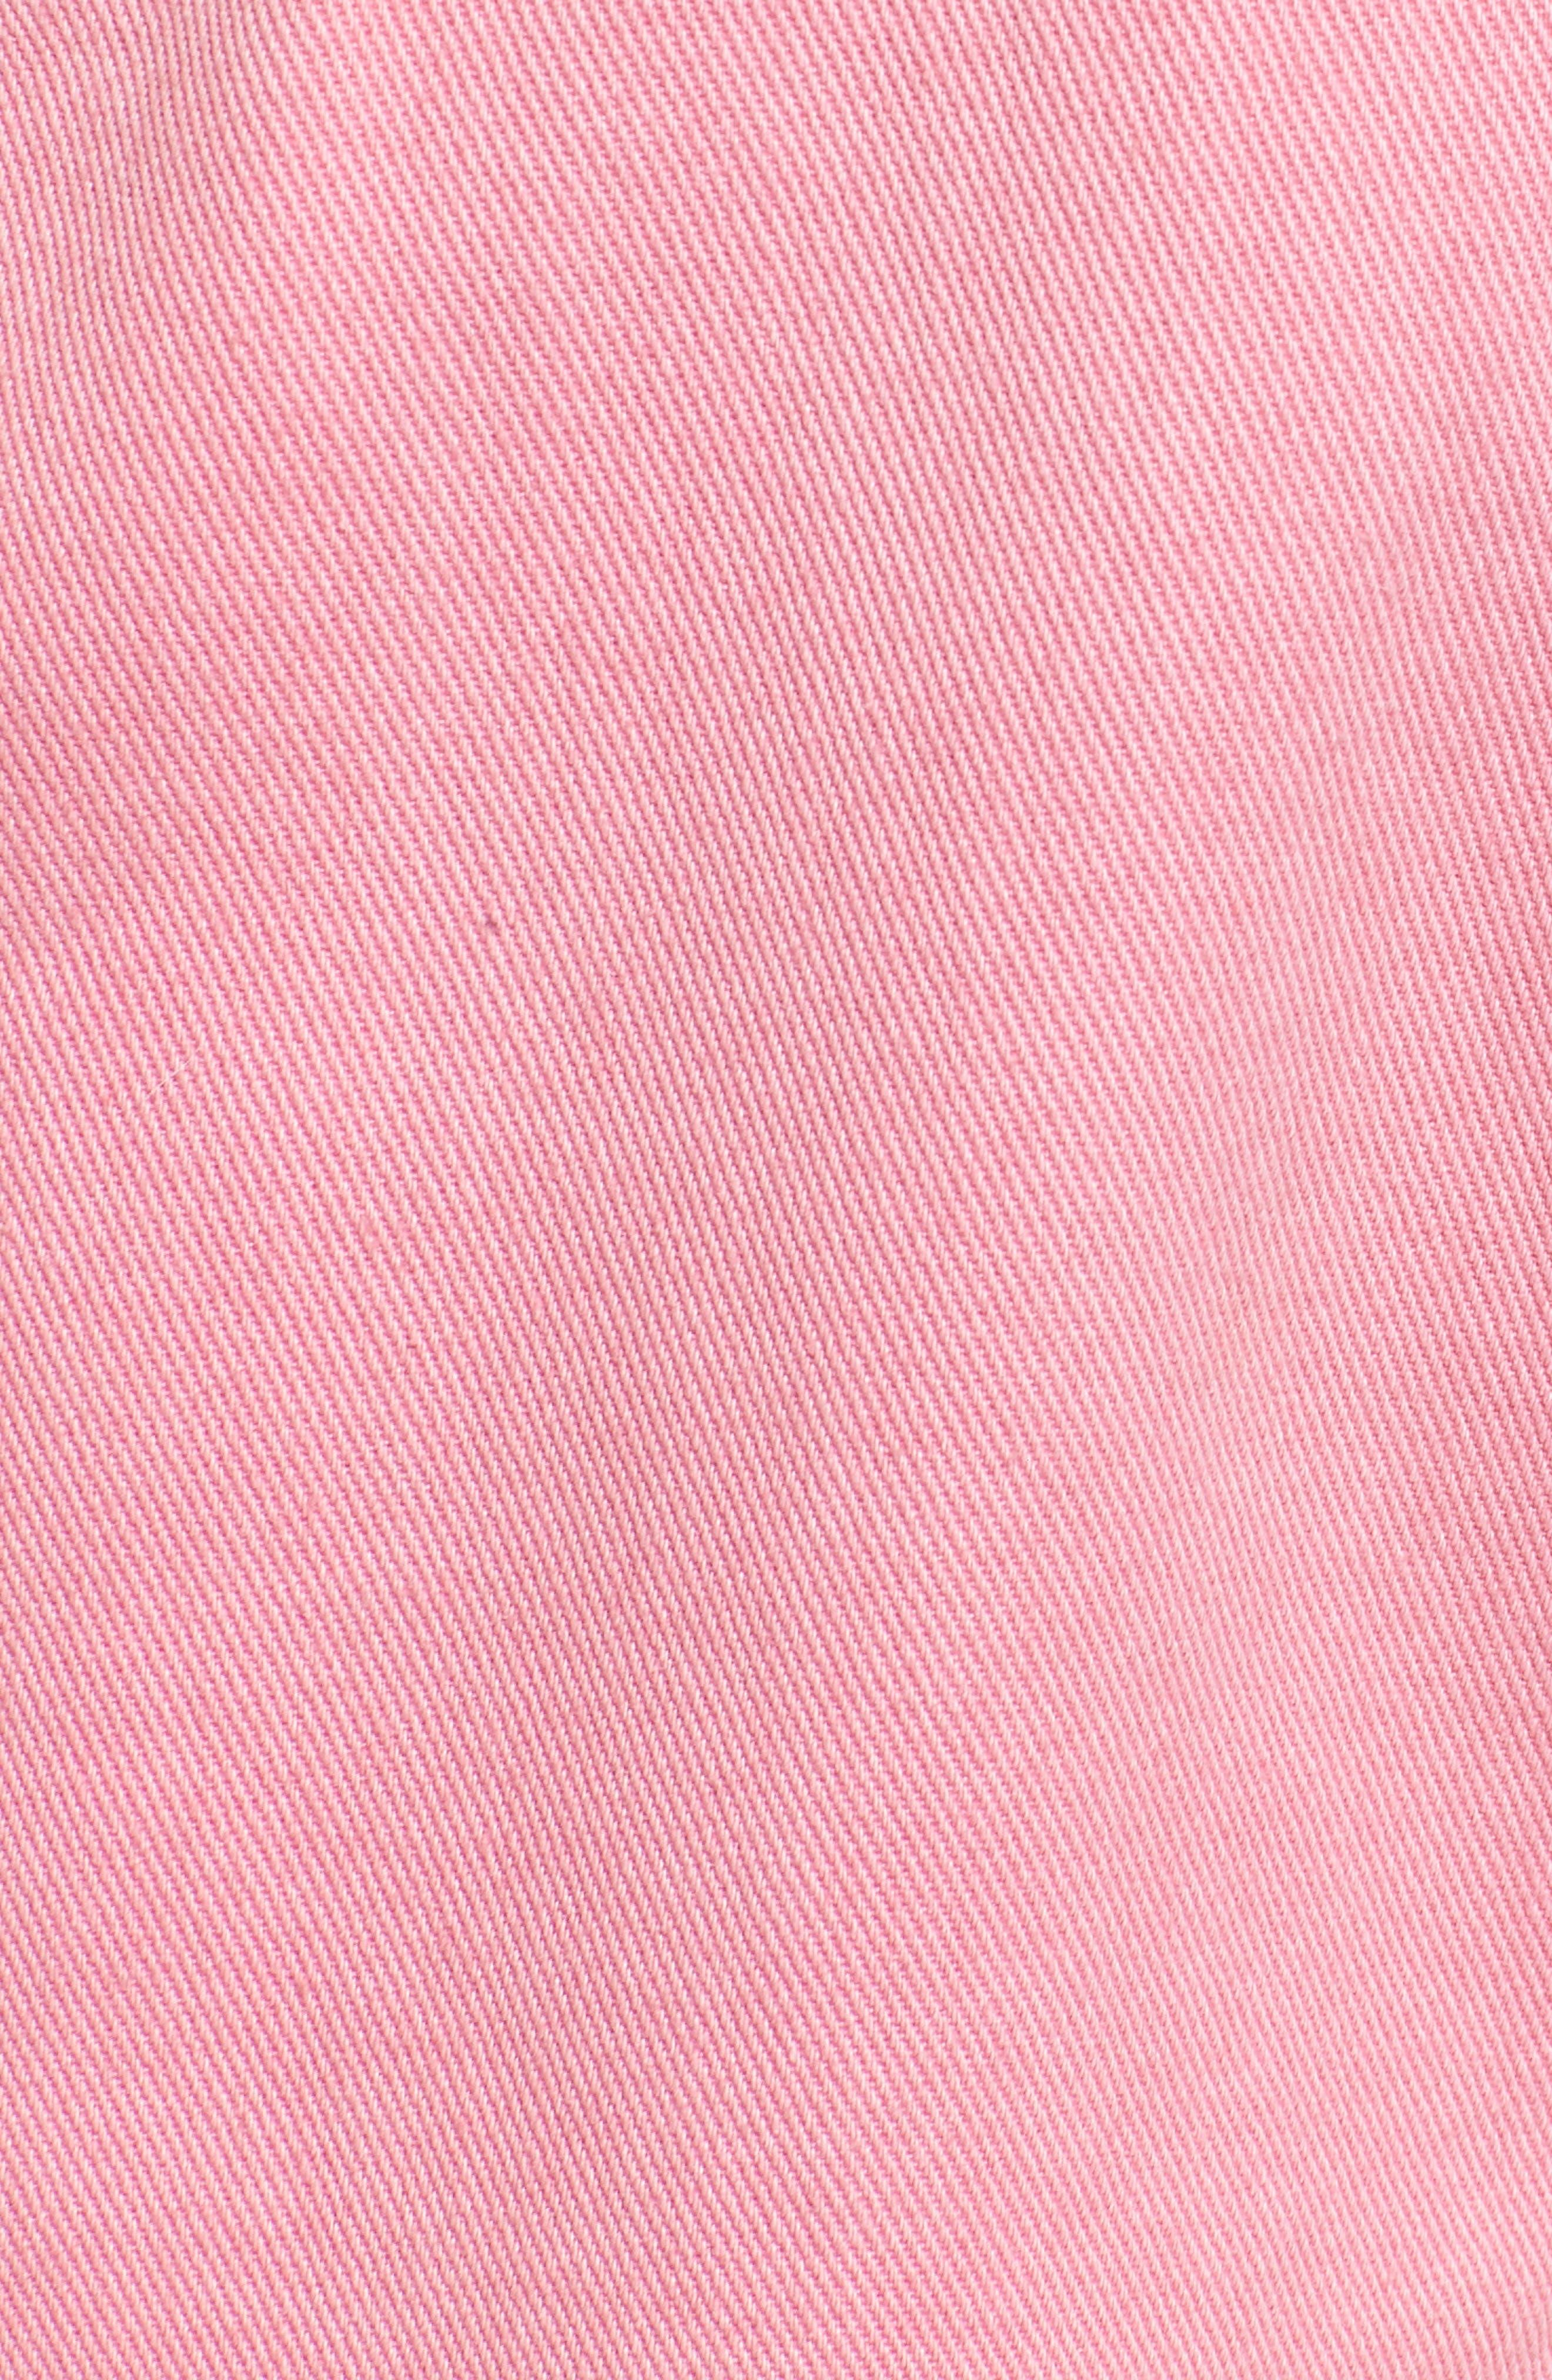 Unionbay Mario Denim Shortalls,                             Alternate thumbnail 5, color,                             Popsicle Pink